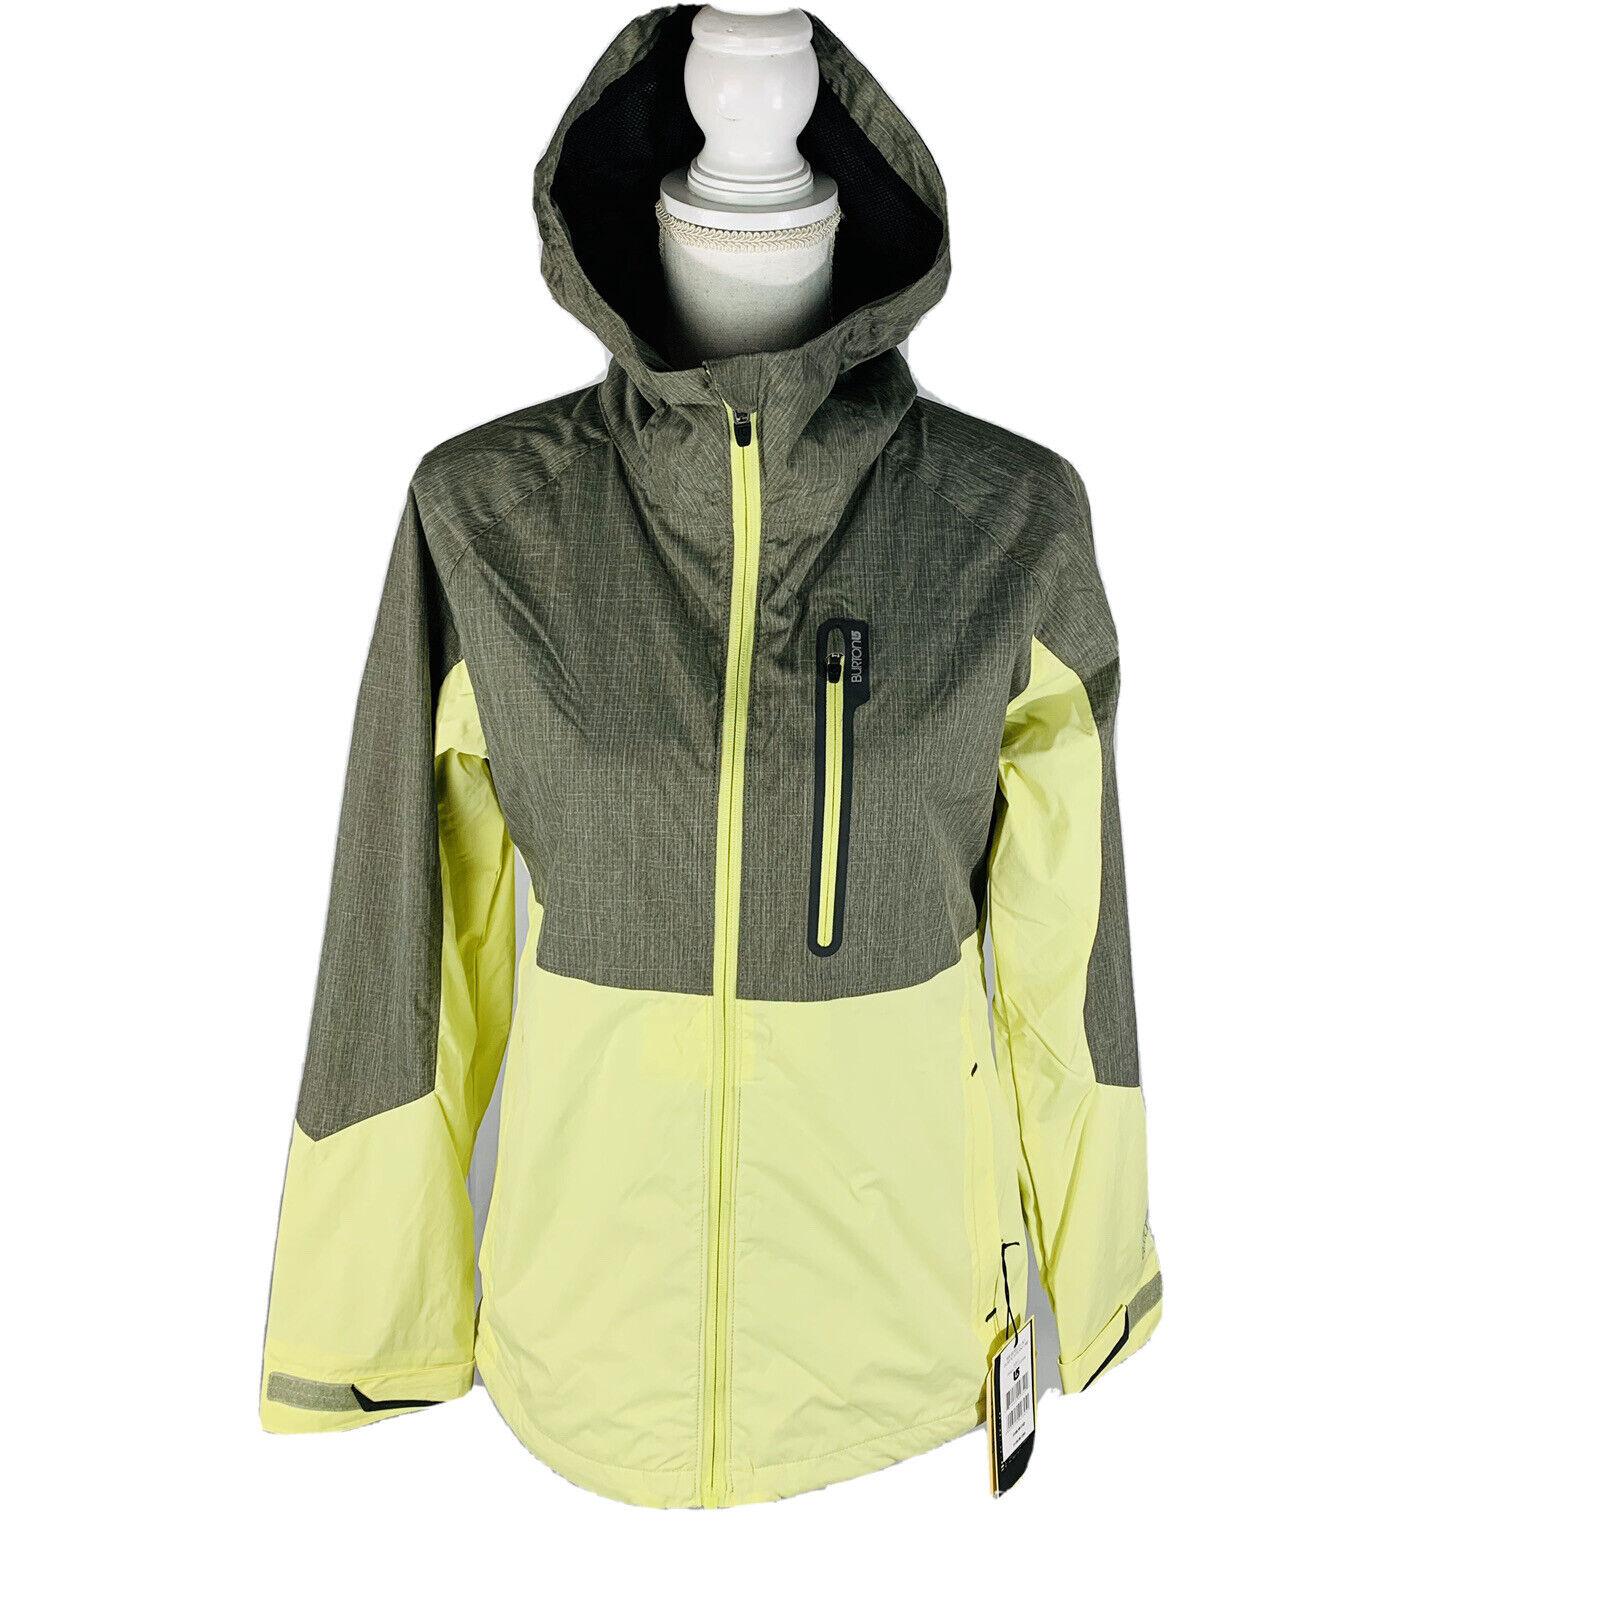 Burton Radar Snowboard Jacket Women S Small Heather Sunny Lime Green Gray New For Sale Online